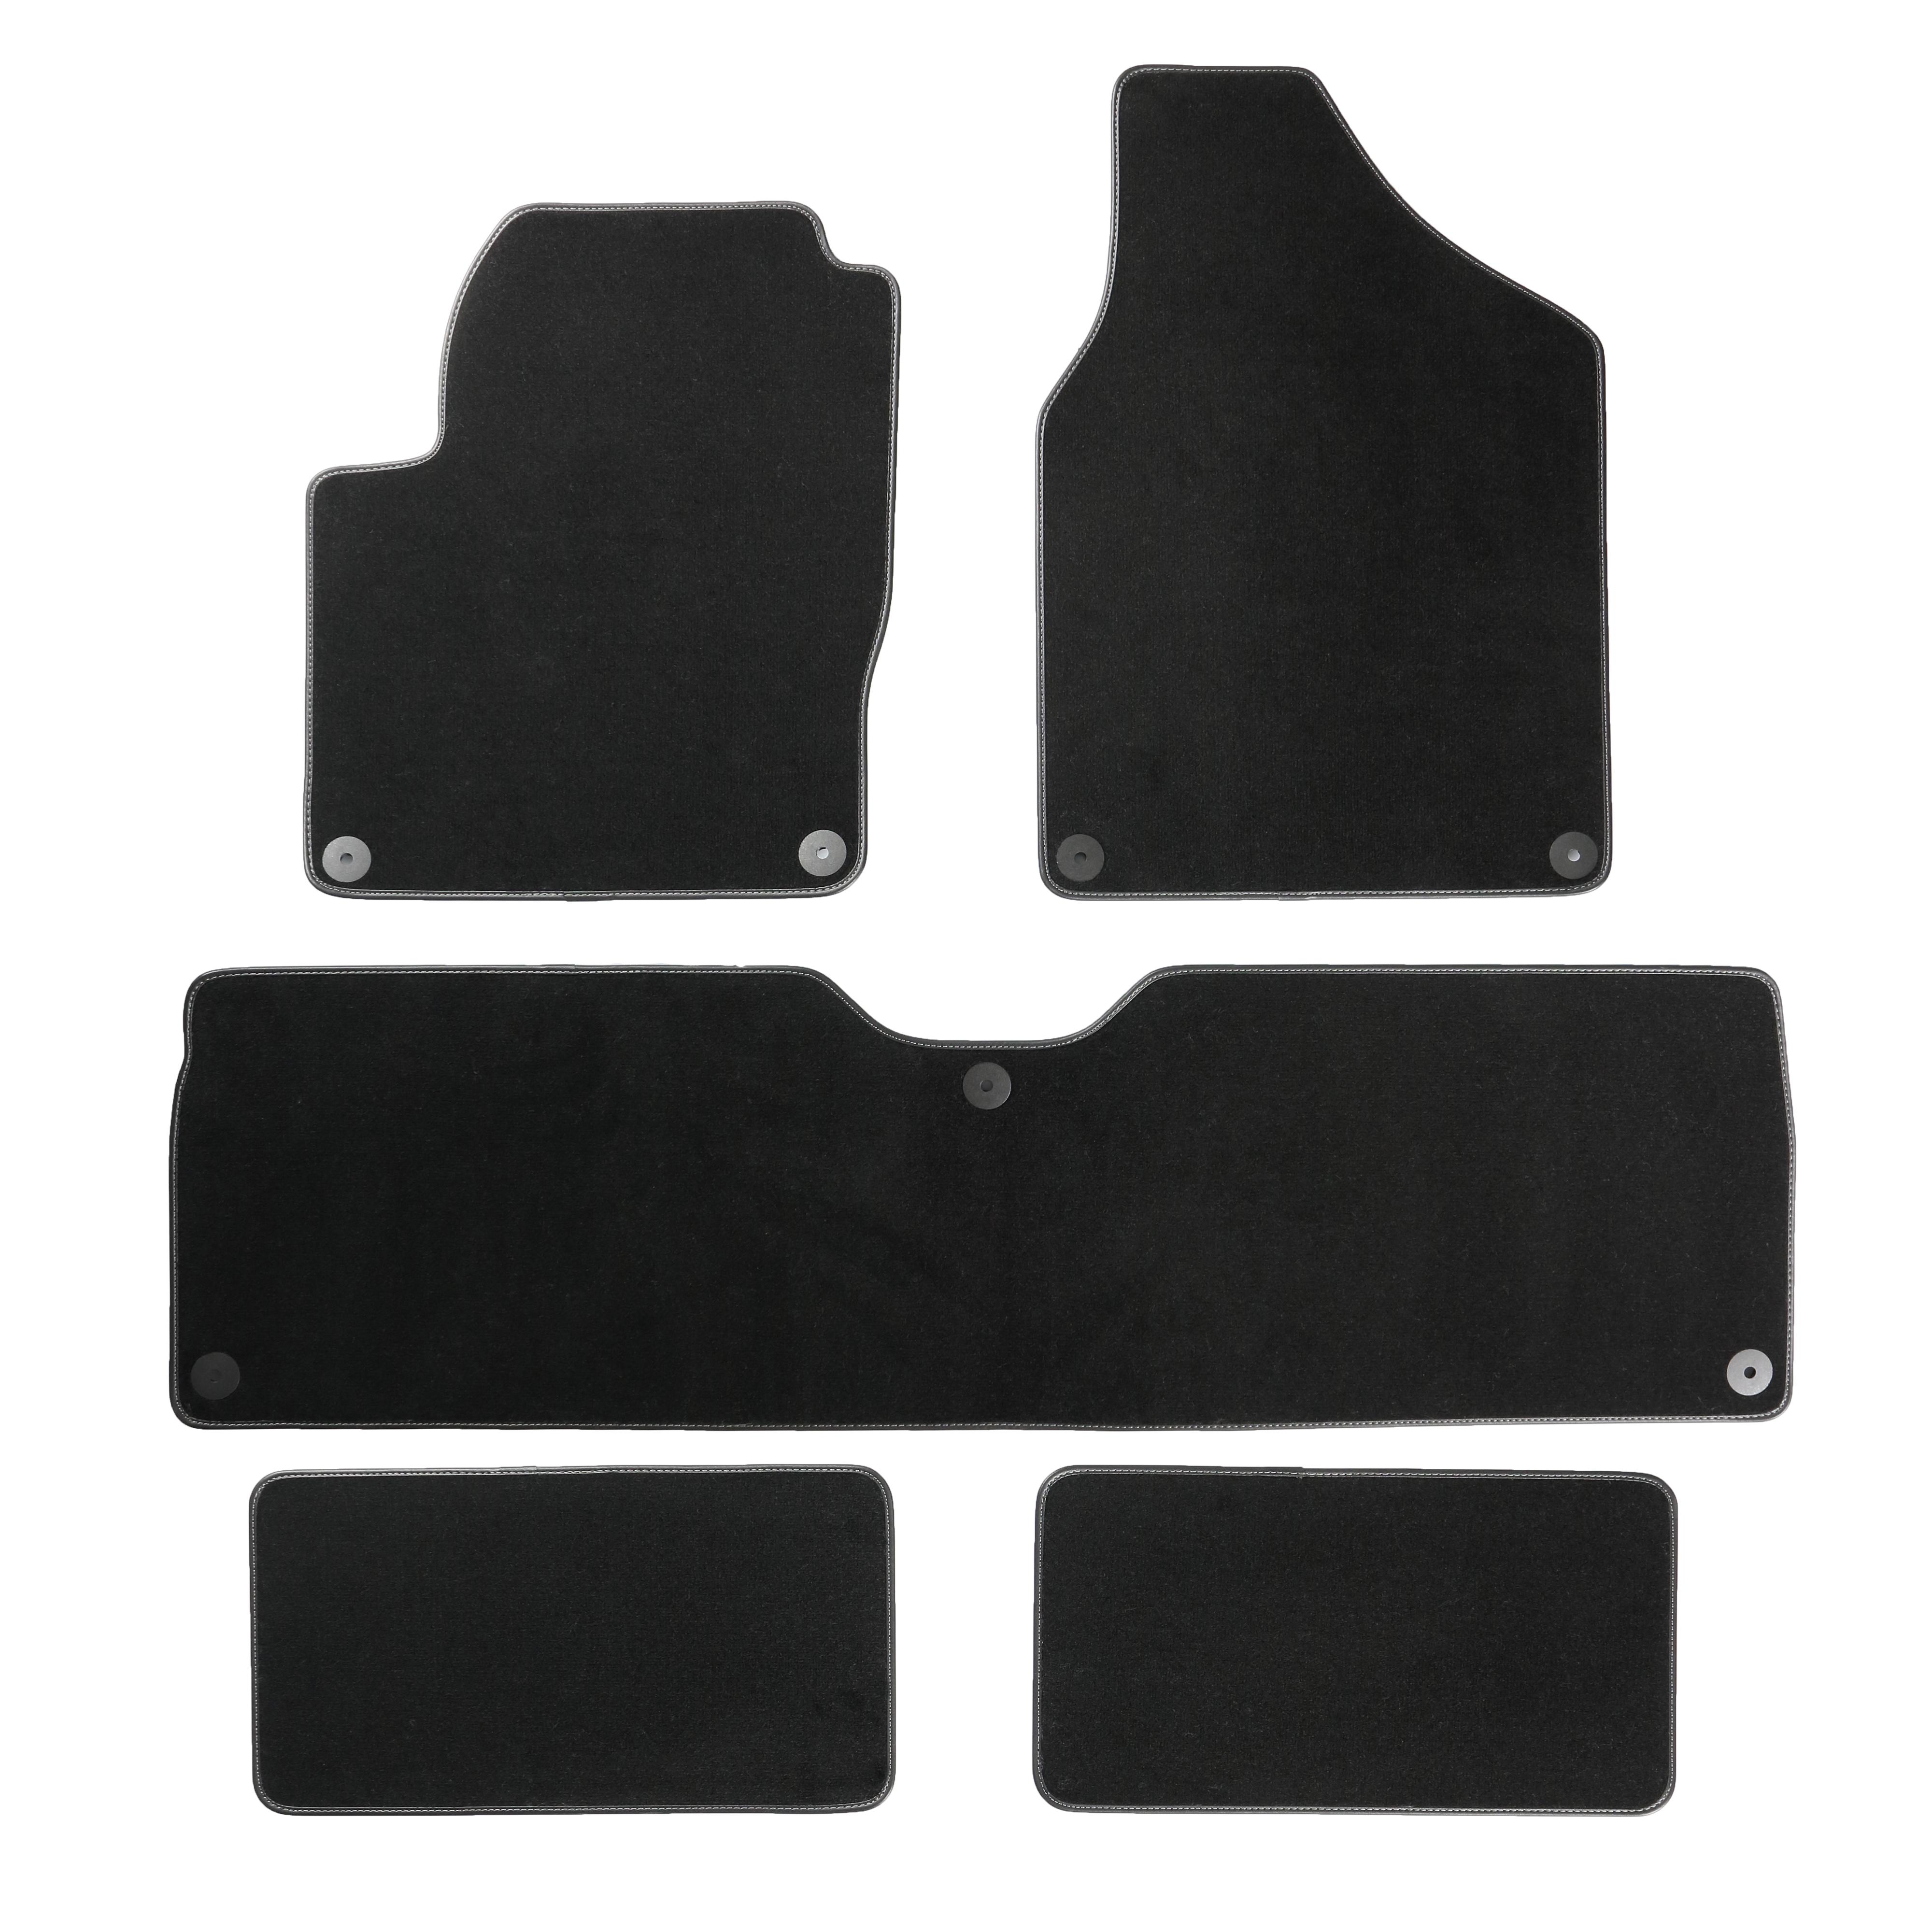 fussmatten vw sharan i 7 sitzer in seuzach kaufen. Black Bedroom Furniture Sets. Home Design Ideas